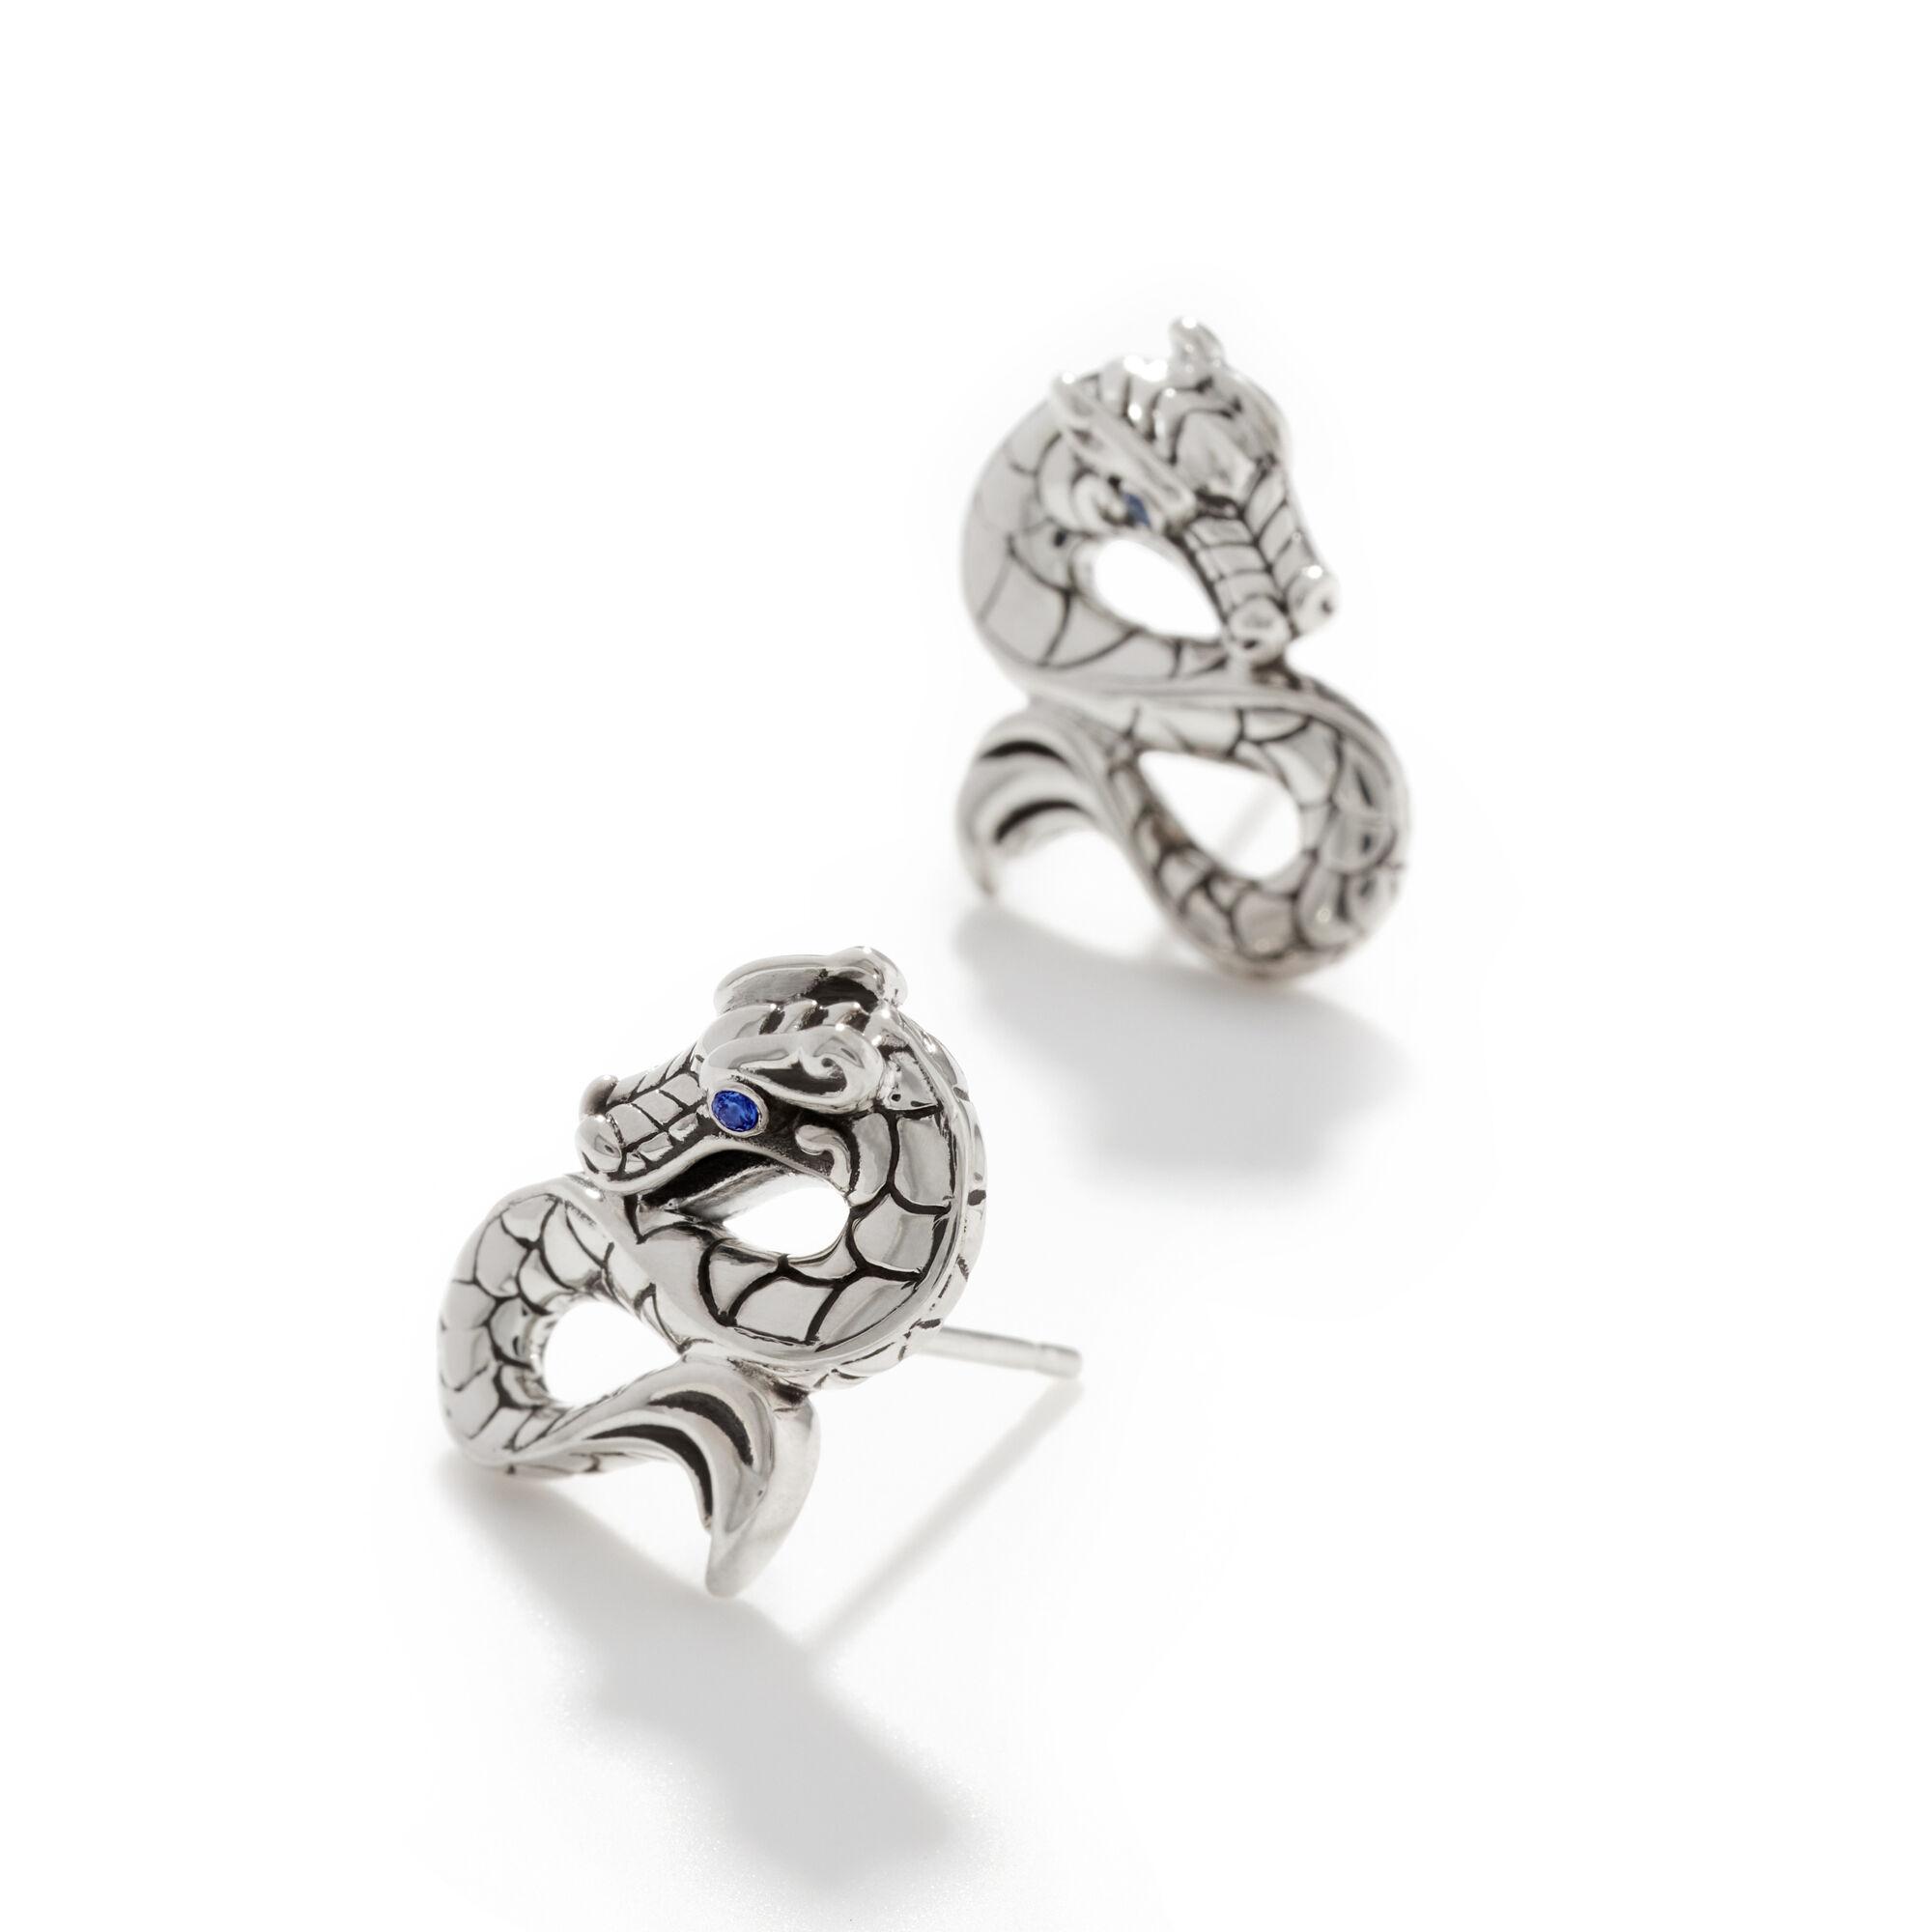 Legends Naga Stud Earrings in Silver, , large